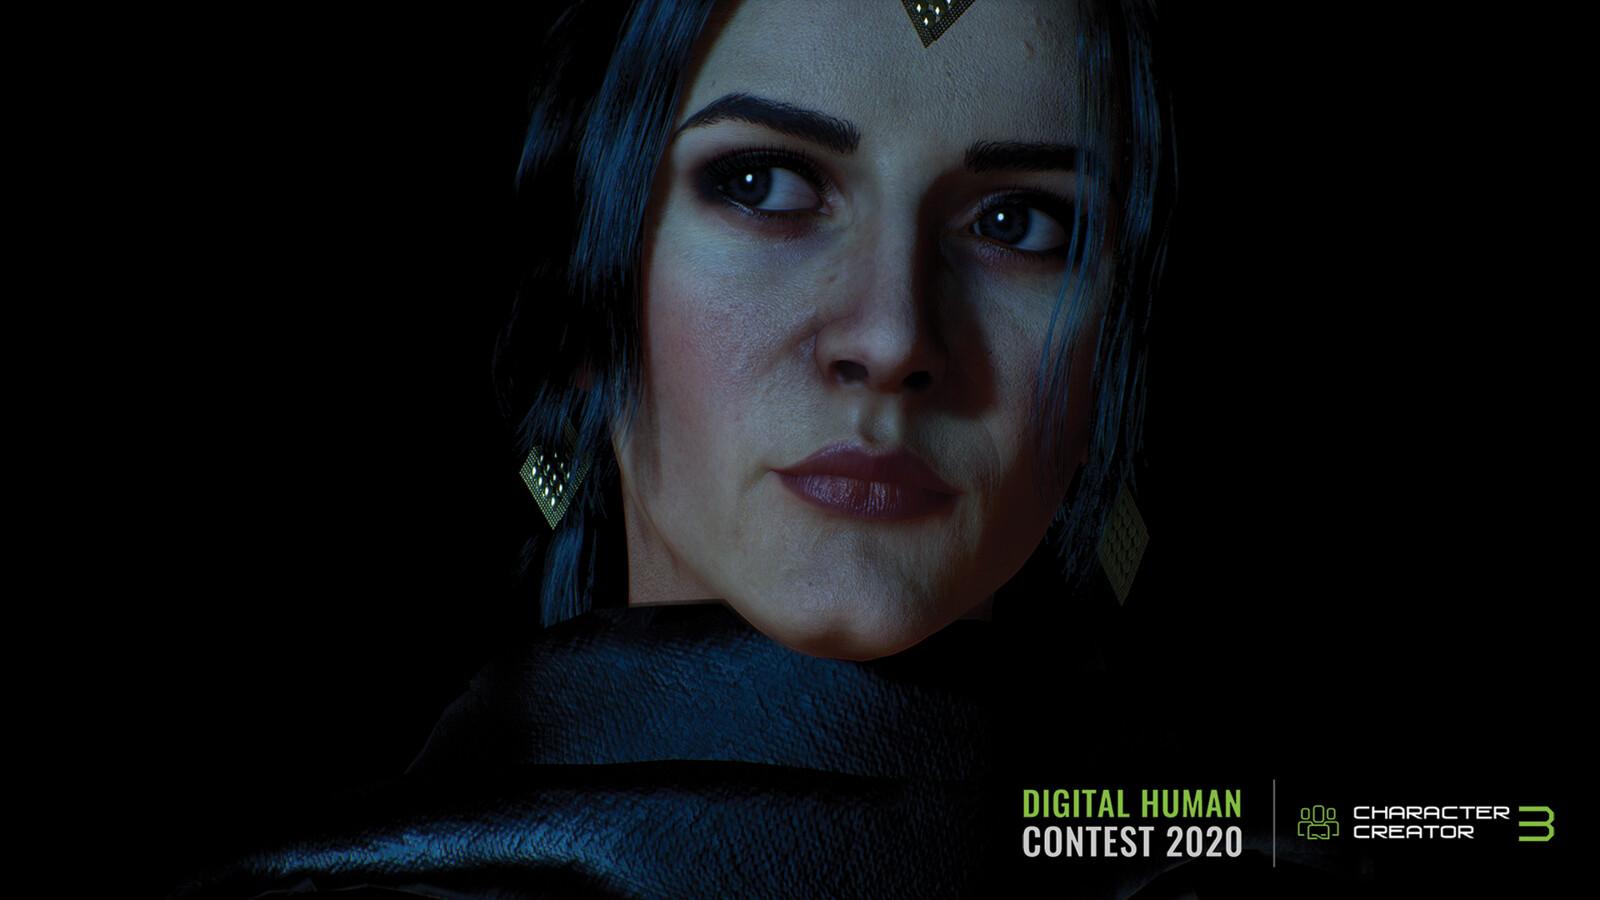 CC Digital Human Contest 2020 - Punjabi Girl